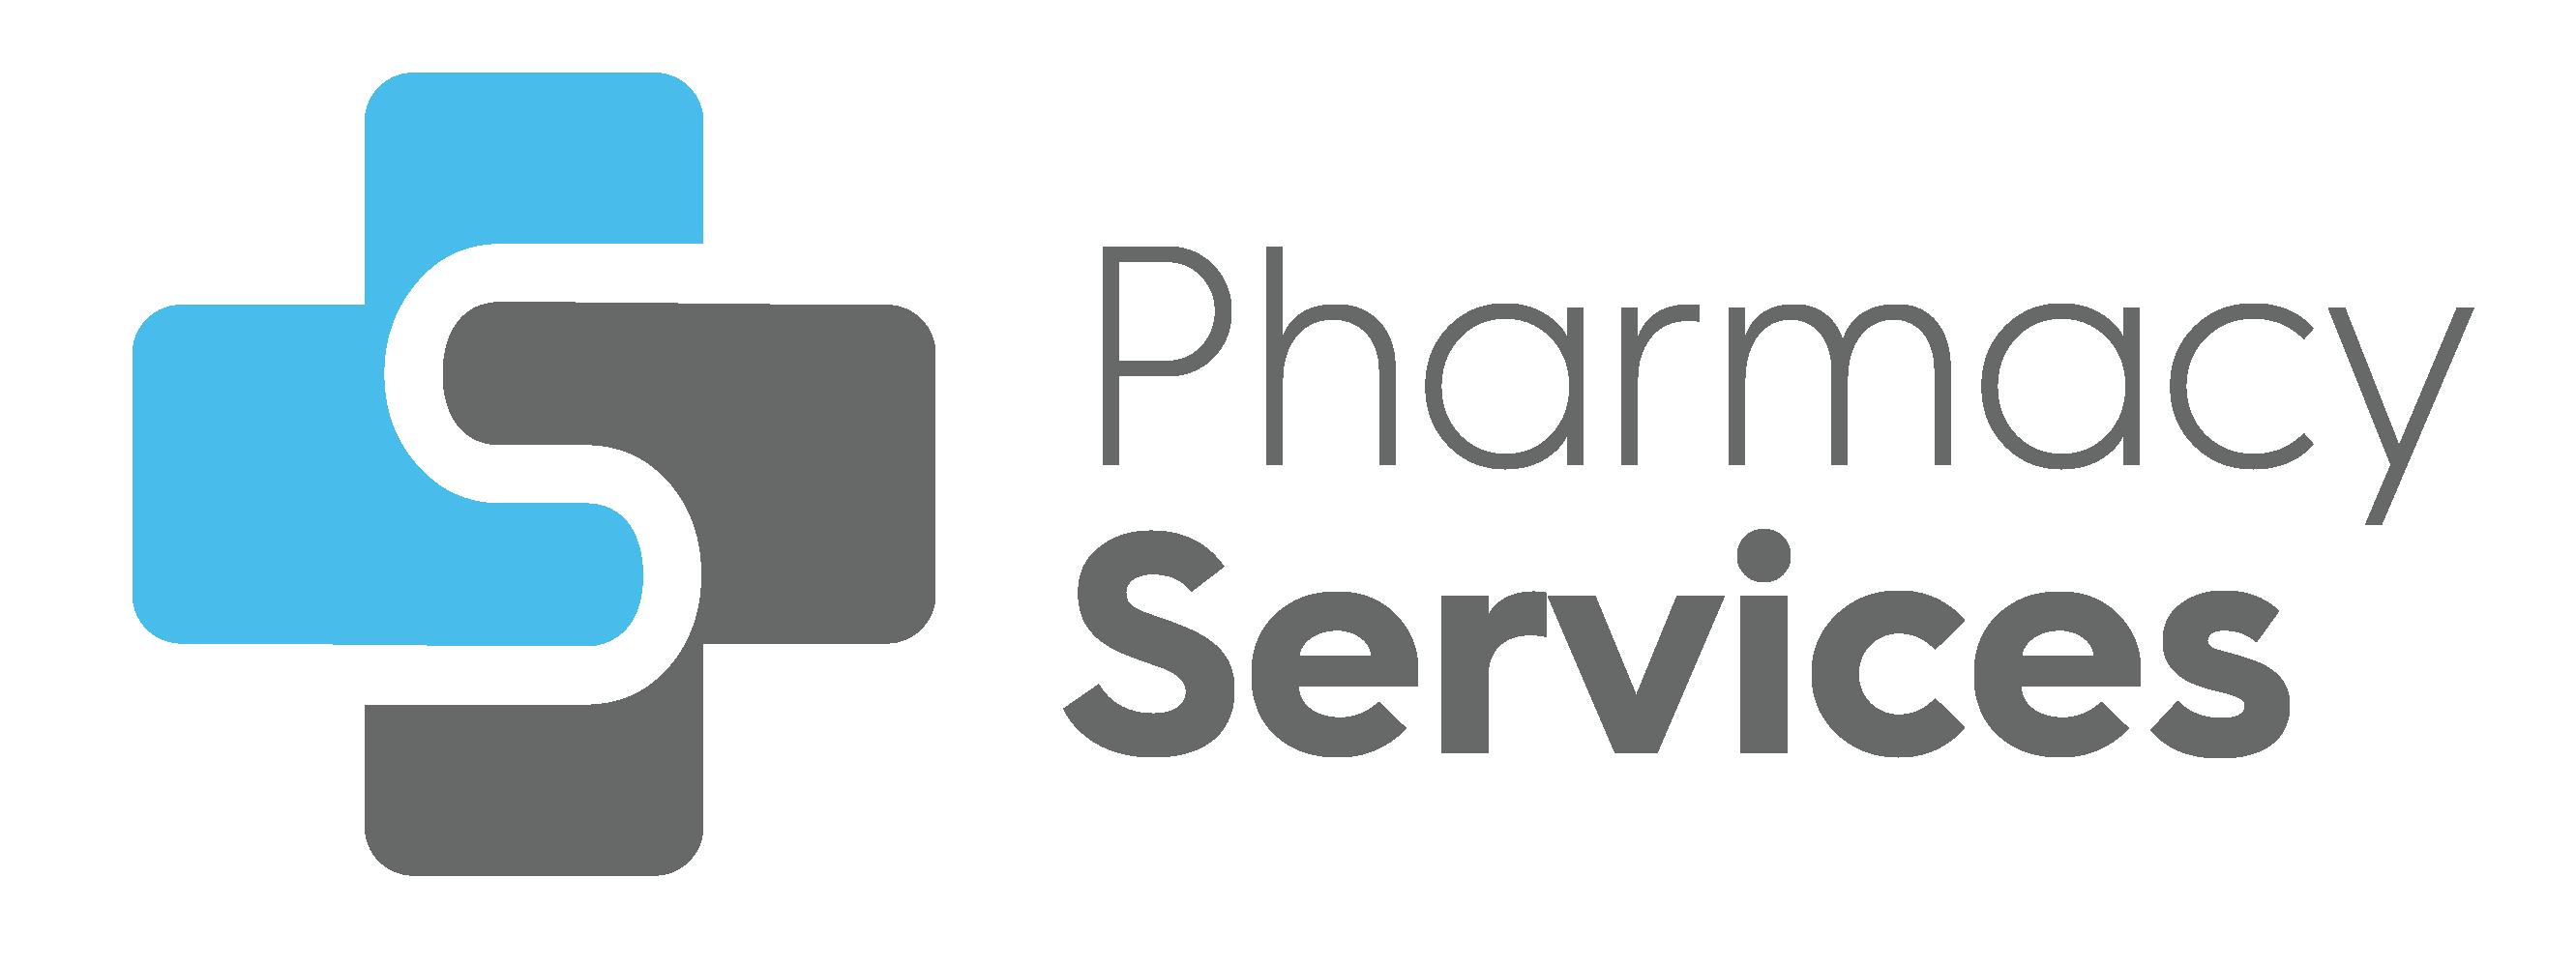 CHS_Pharmacy Services logo-1